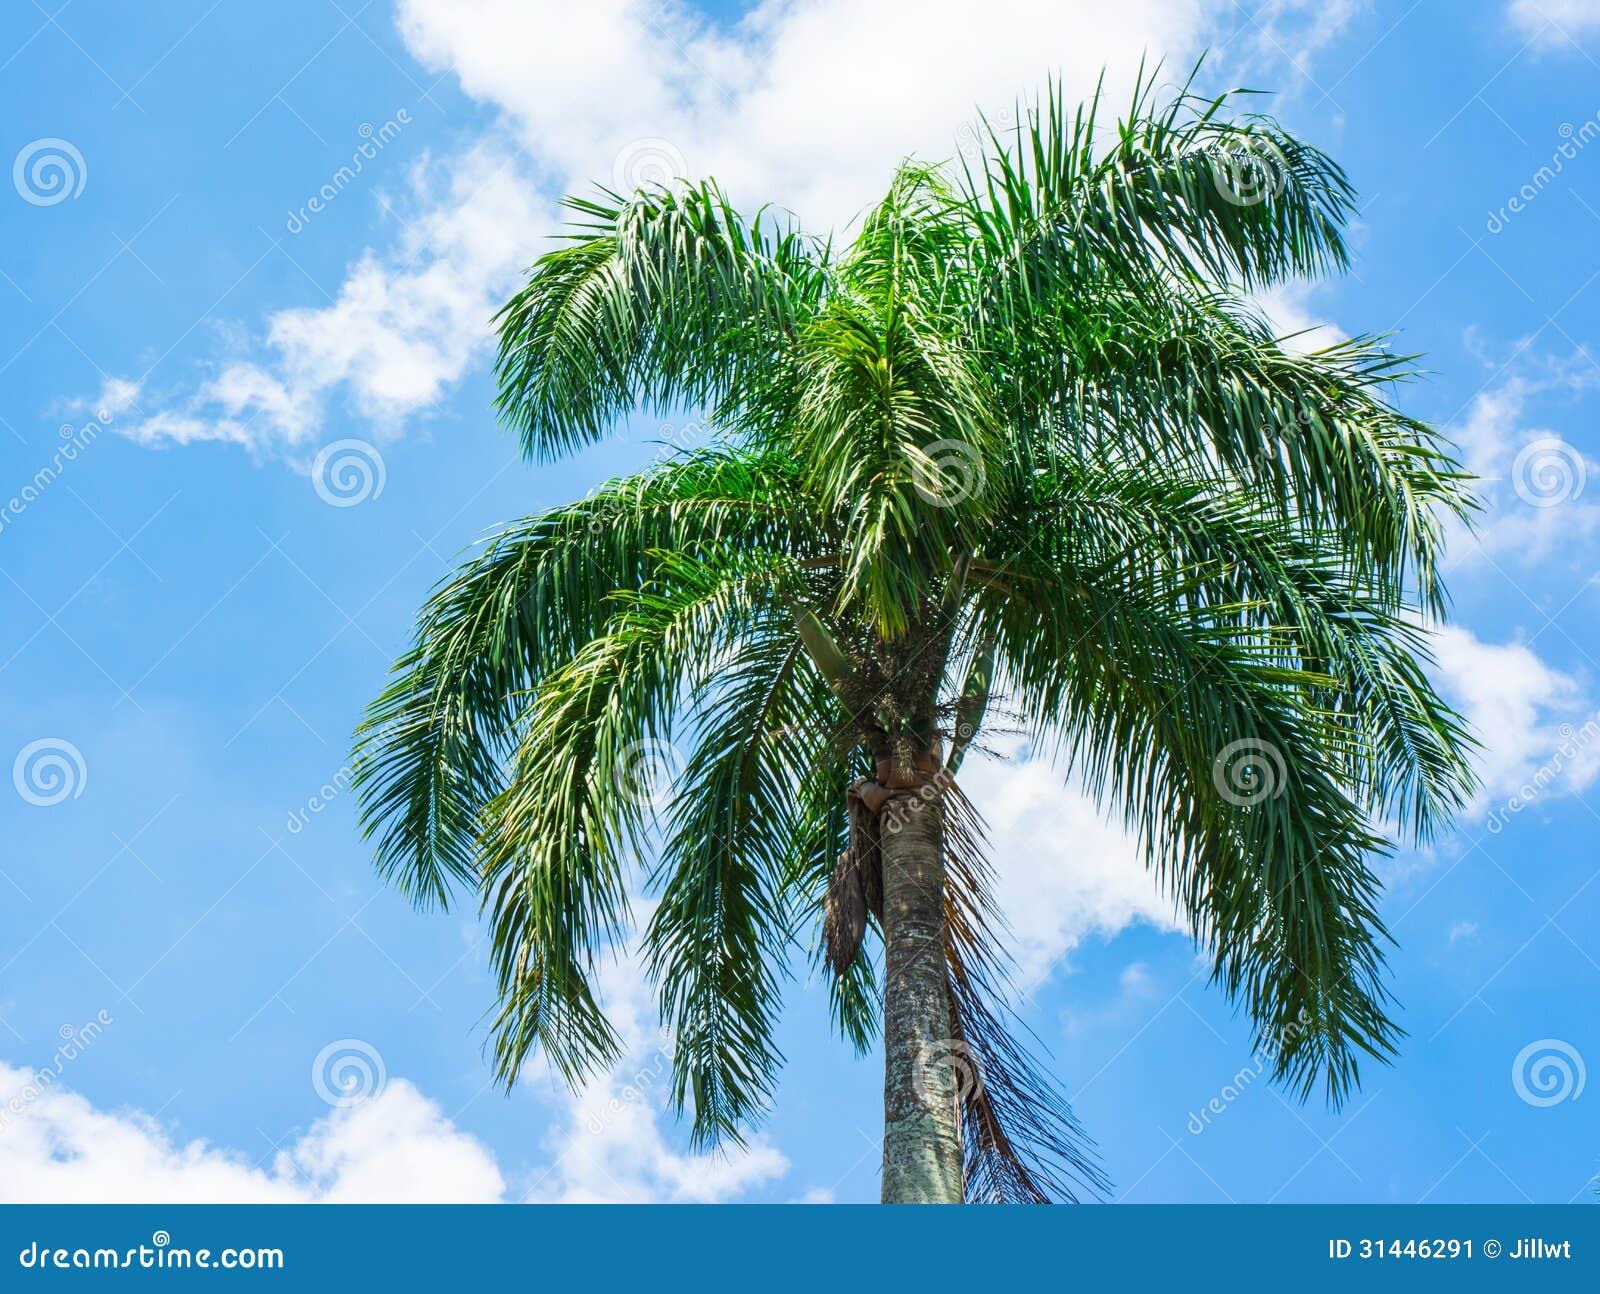 trees palm blue - photo #17